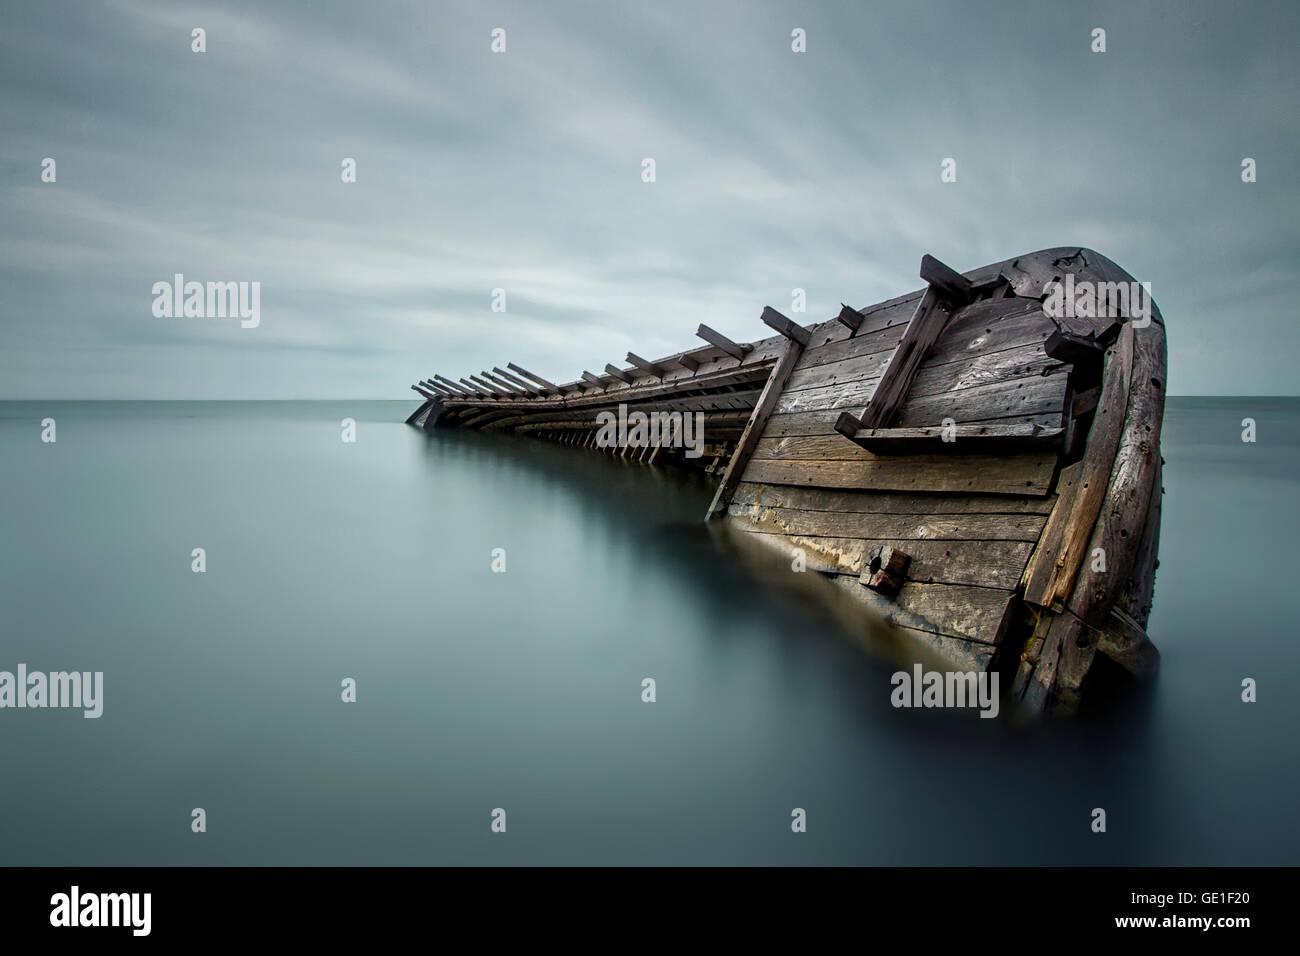 Des naufragés de la mer en bateau Photo Stock